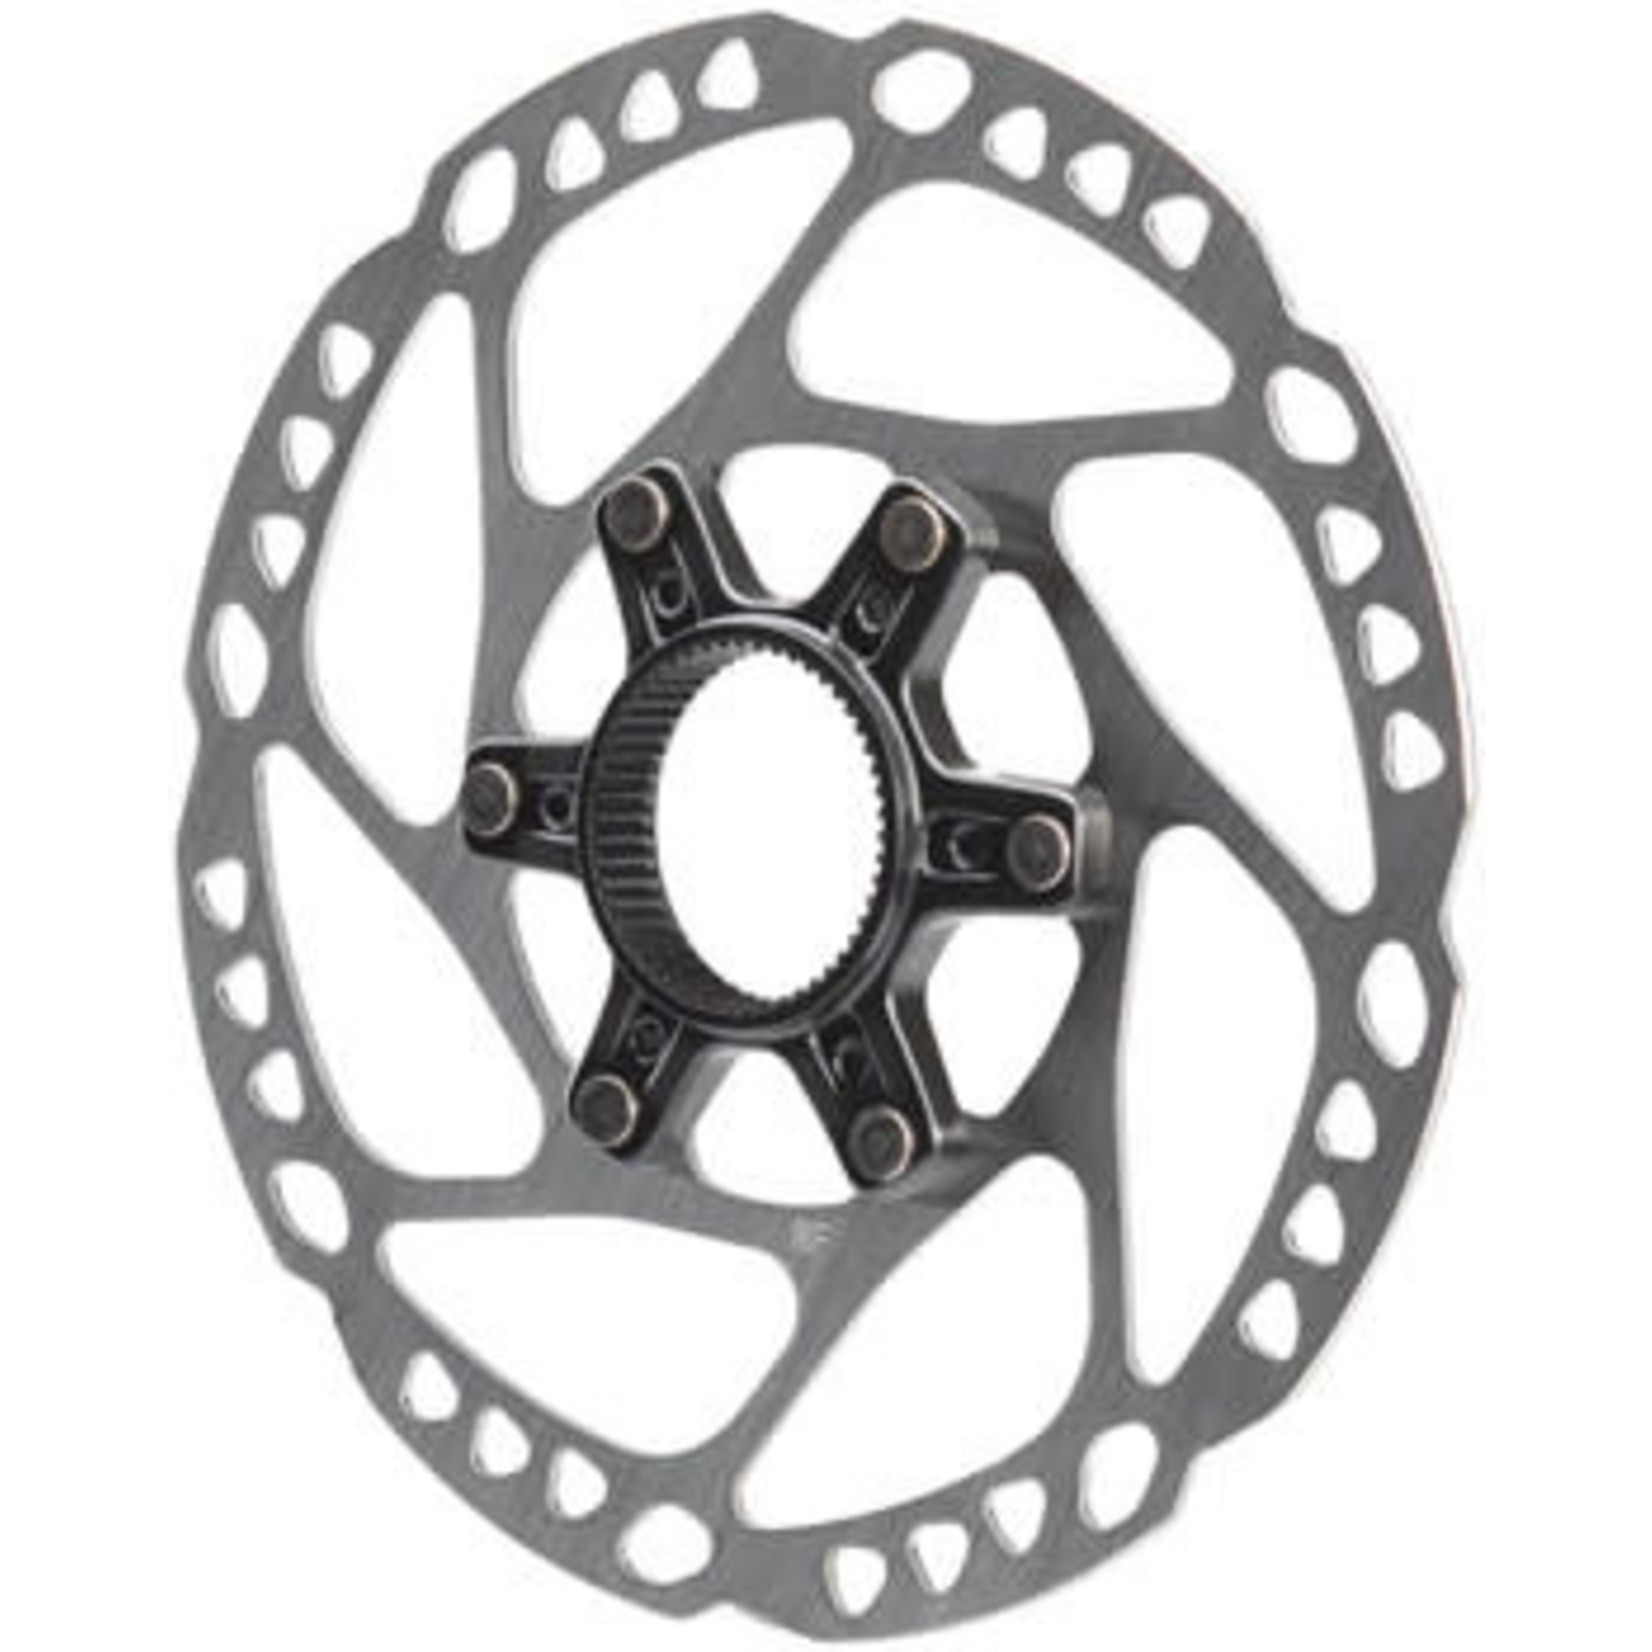 Shimano GRX SM-RT64-S Disc Brake Rotor with External Lockring - 160mm, Center Lock, Silver